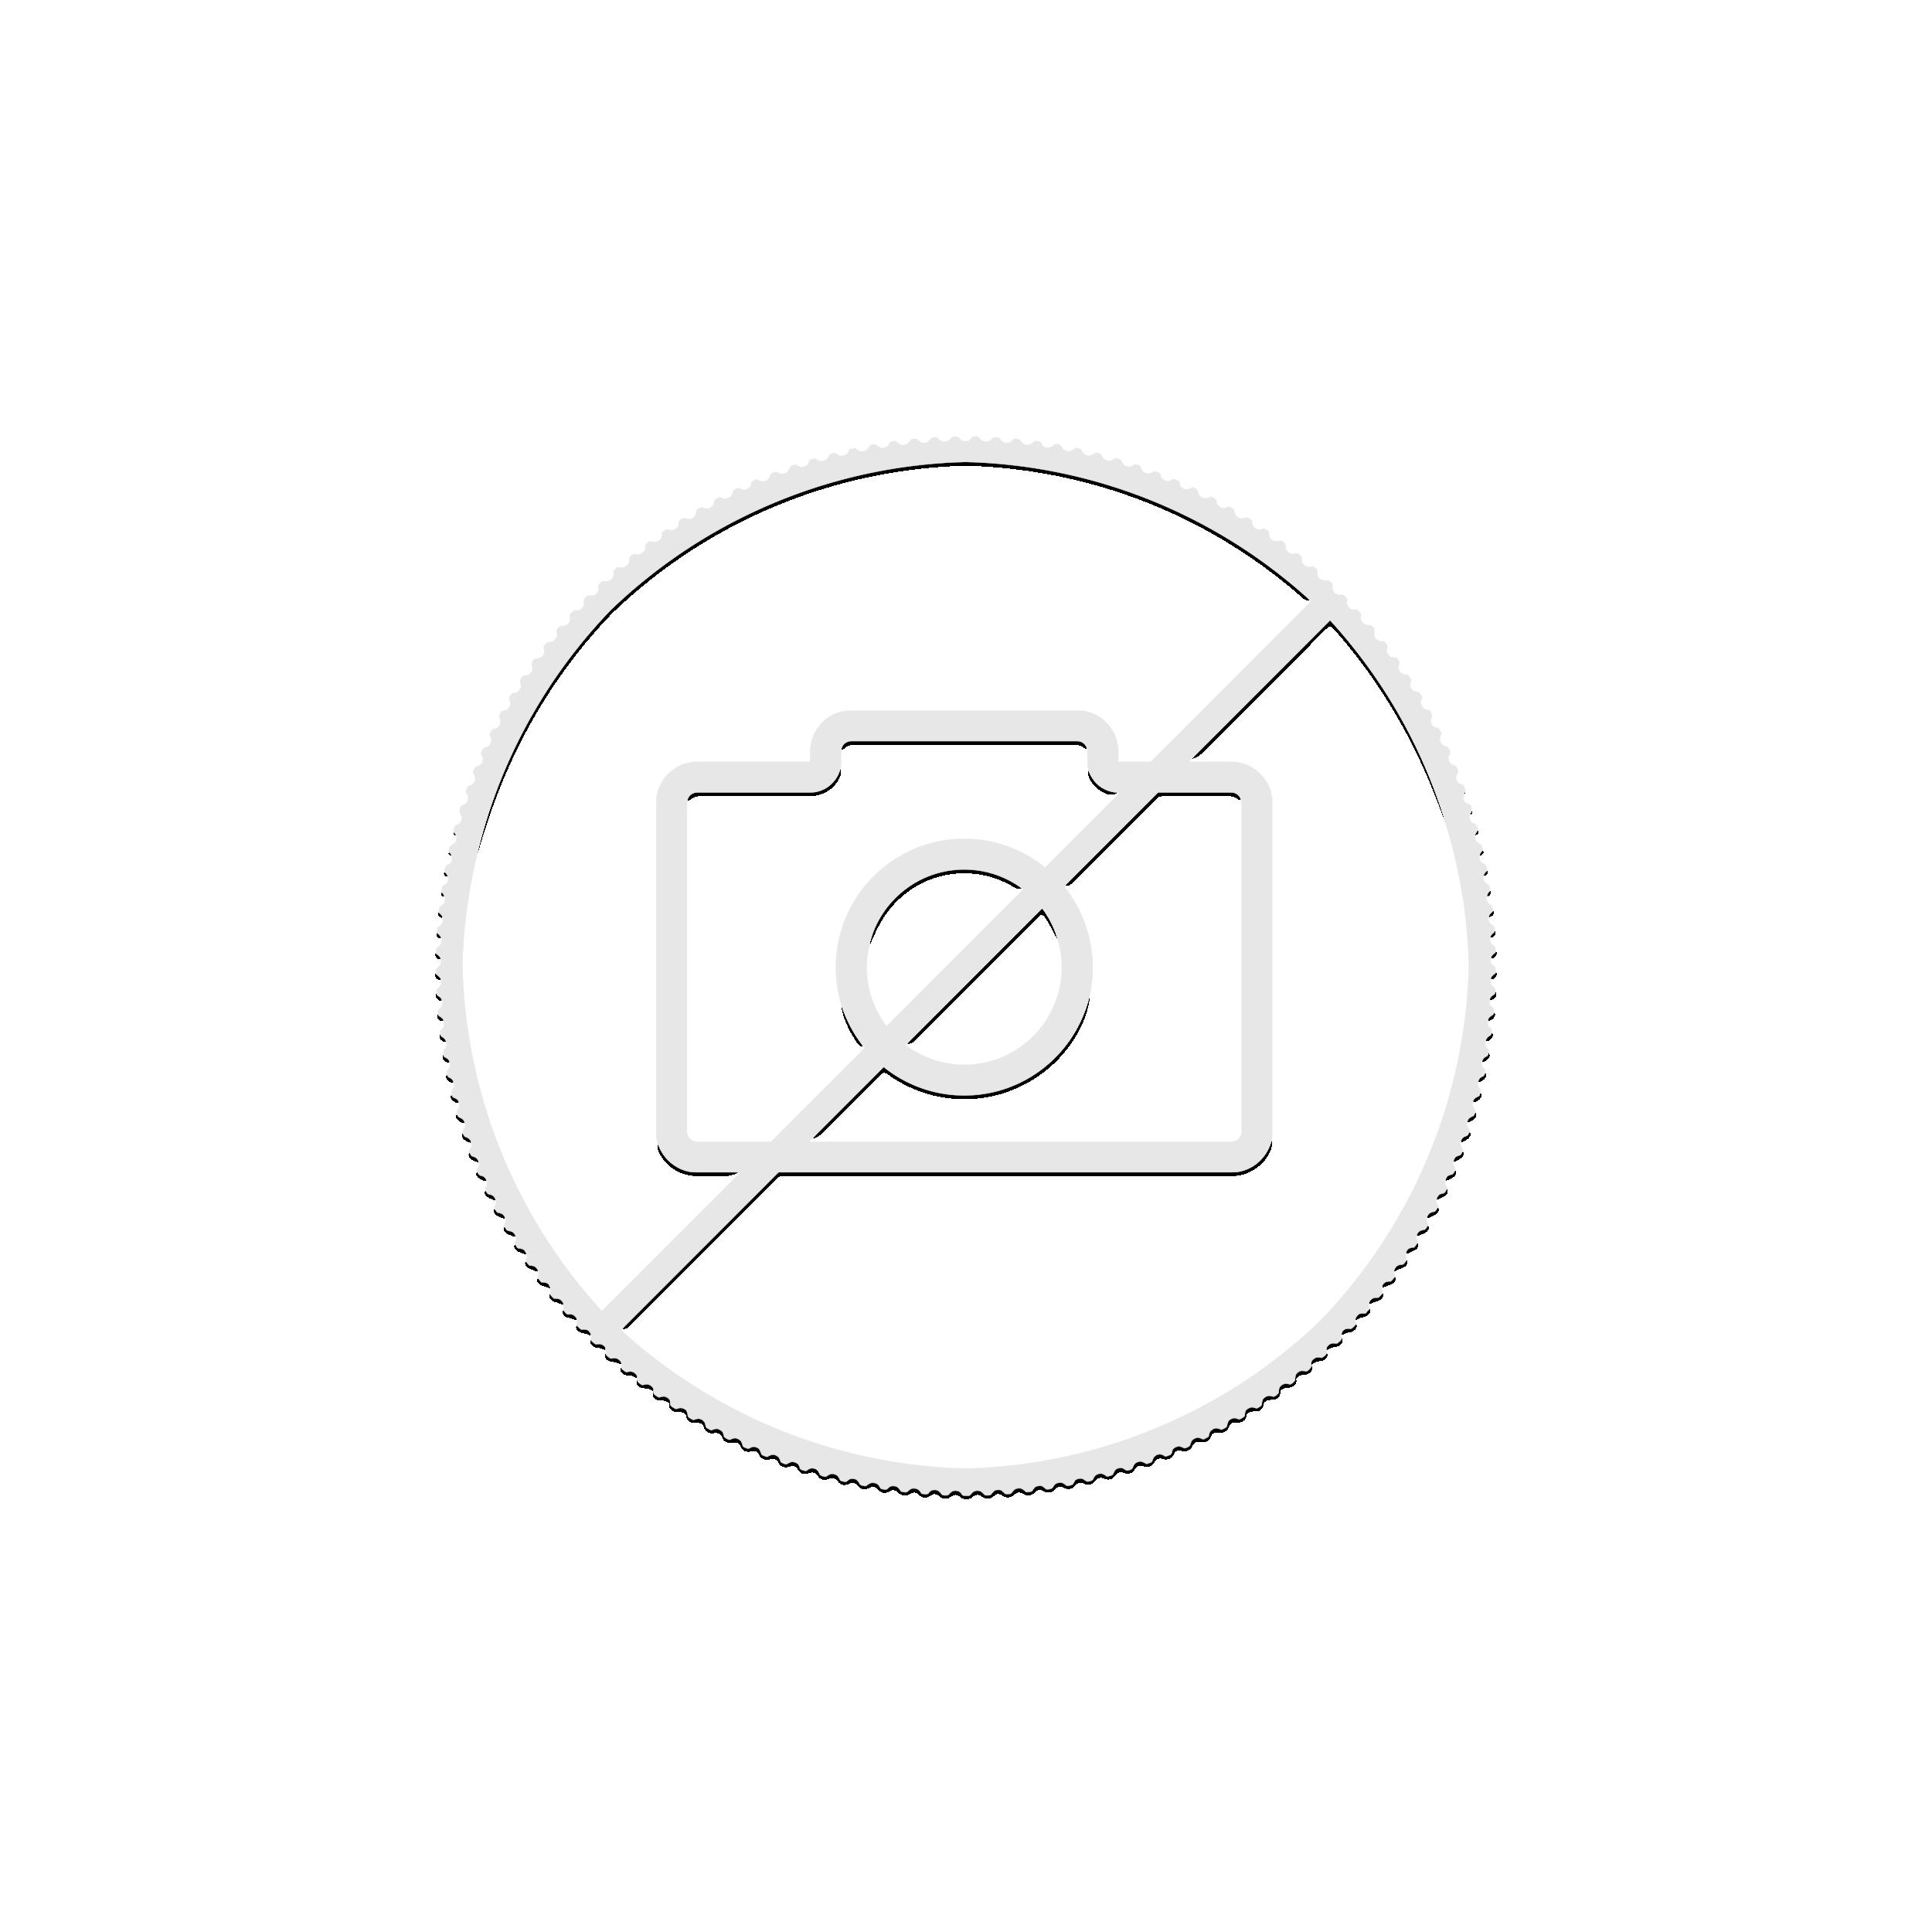 1 Troy ounce gouden munt Lunar 2010 Queen Elizabeth II